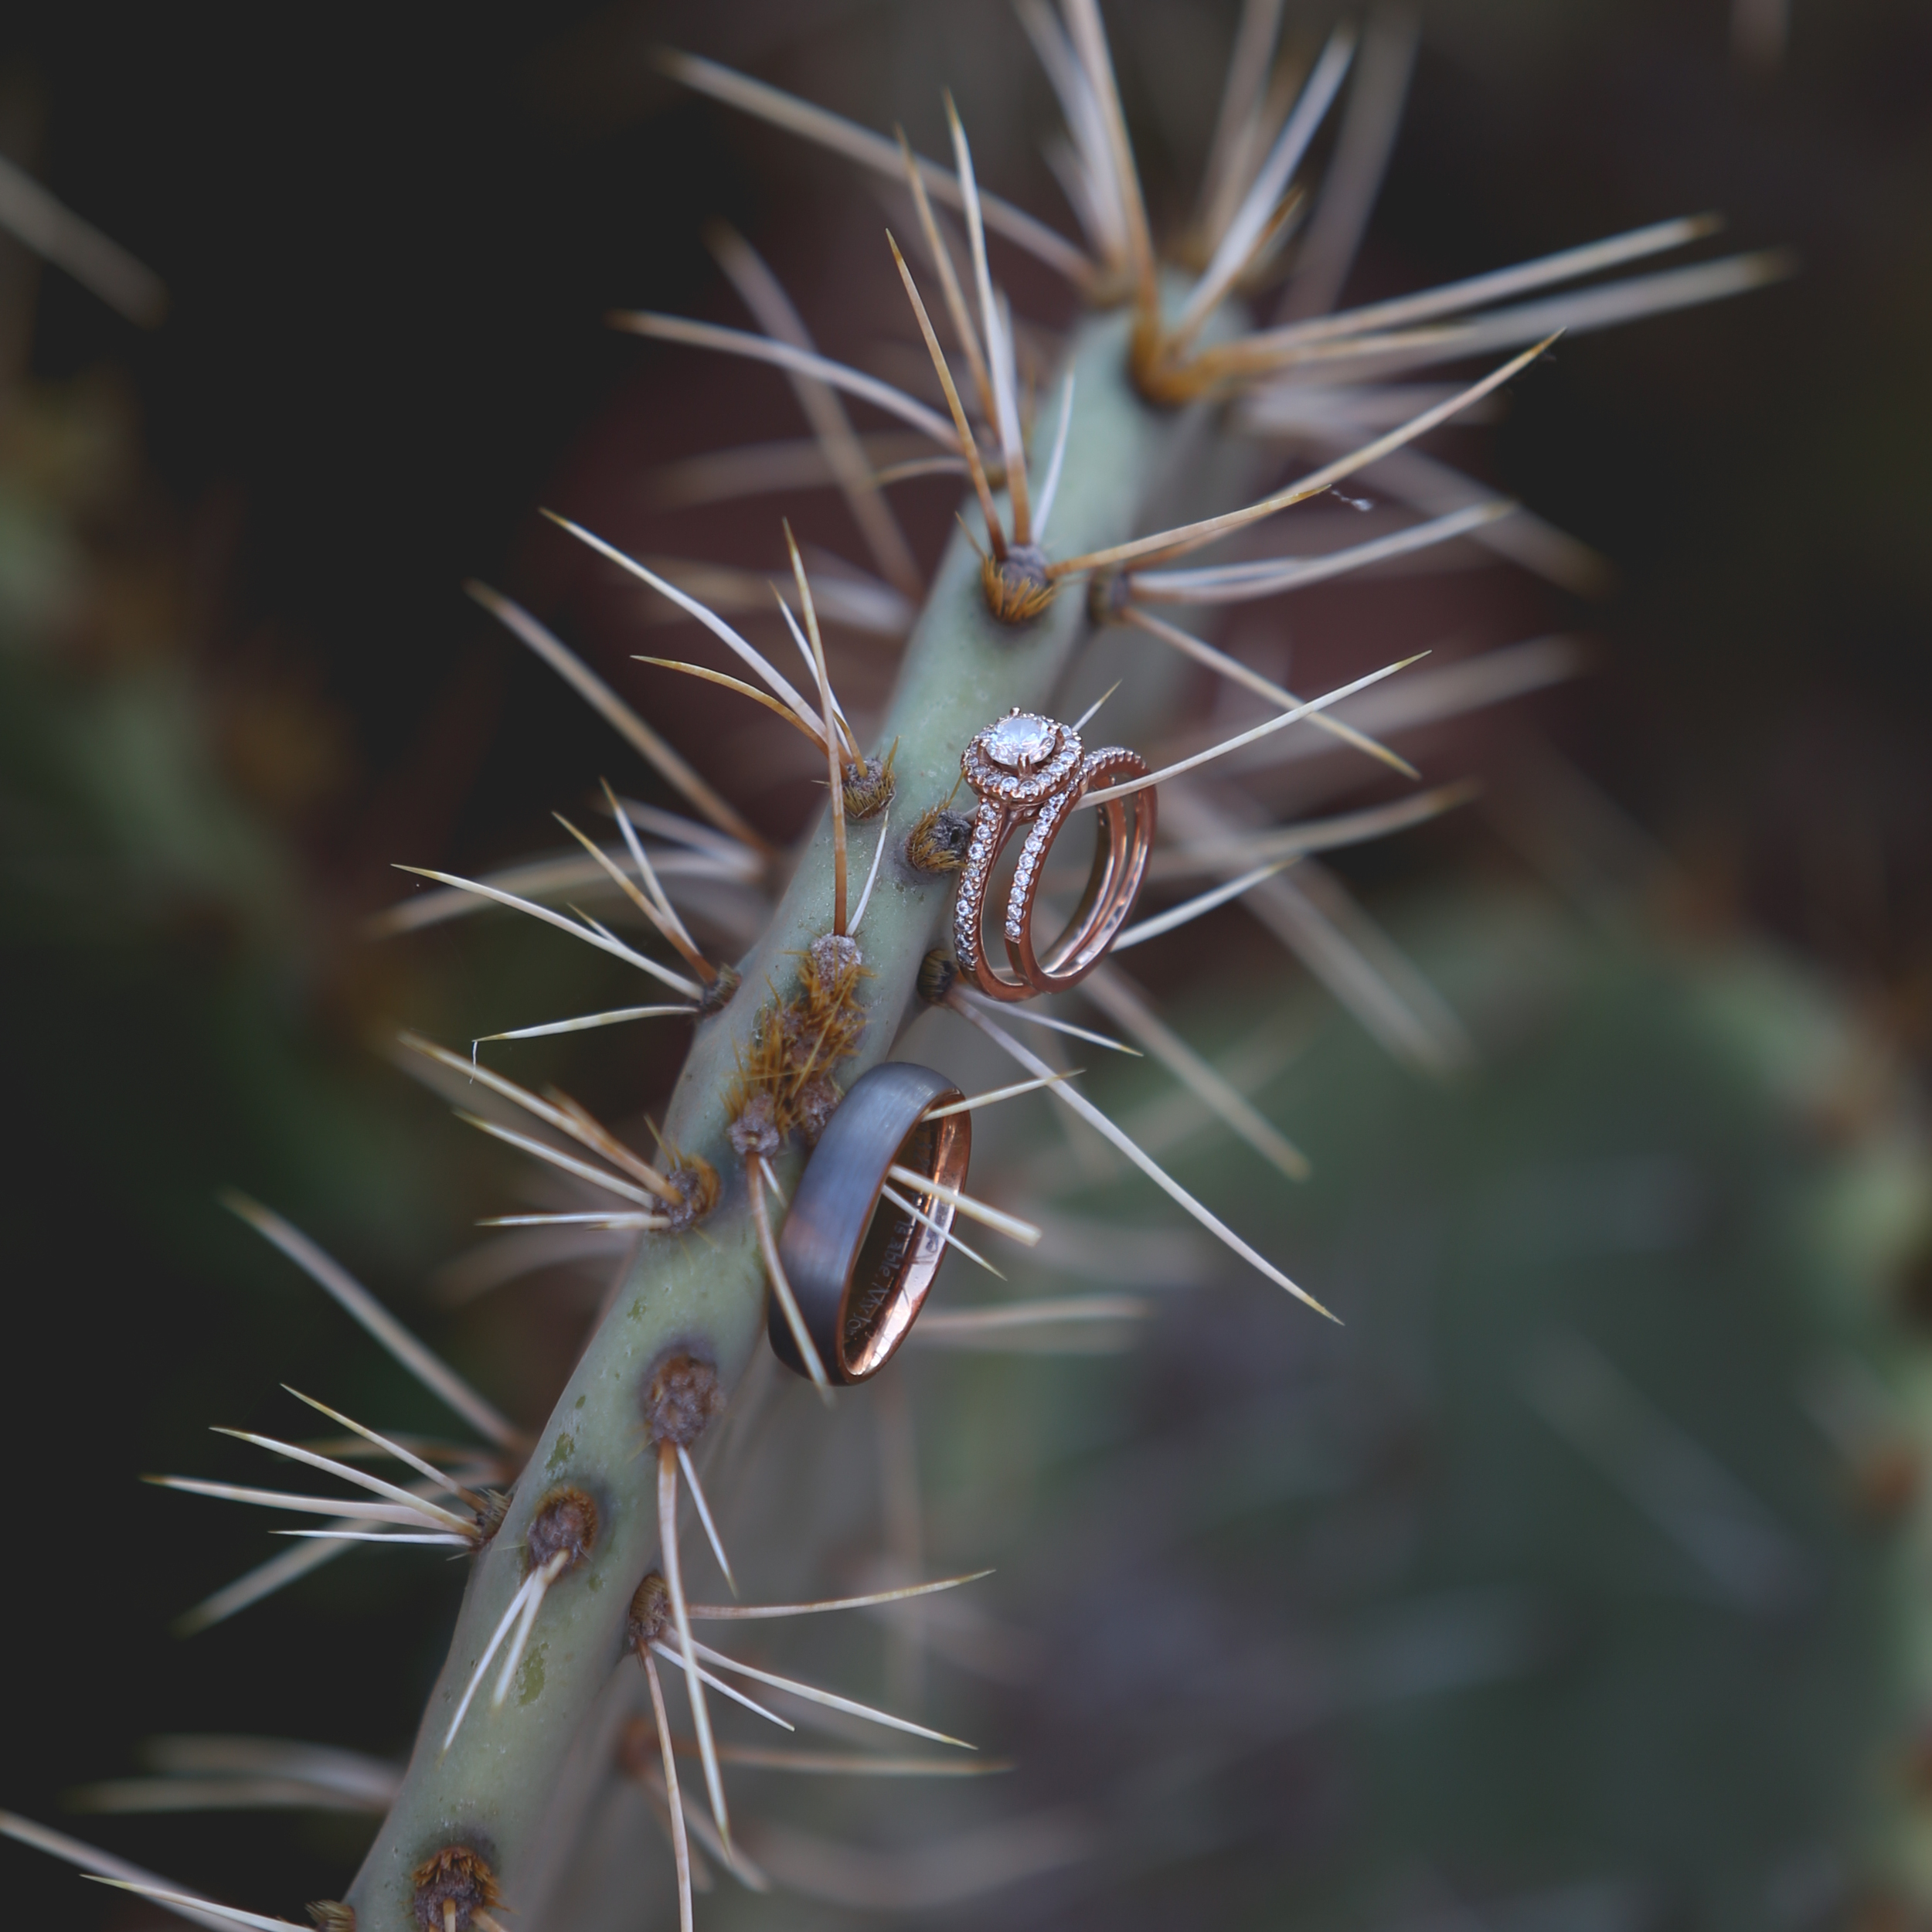 Honeymoon_Arizona_JonCourvillePhotography-8.jpg